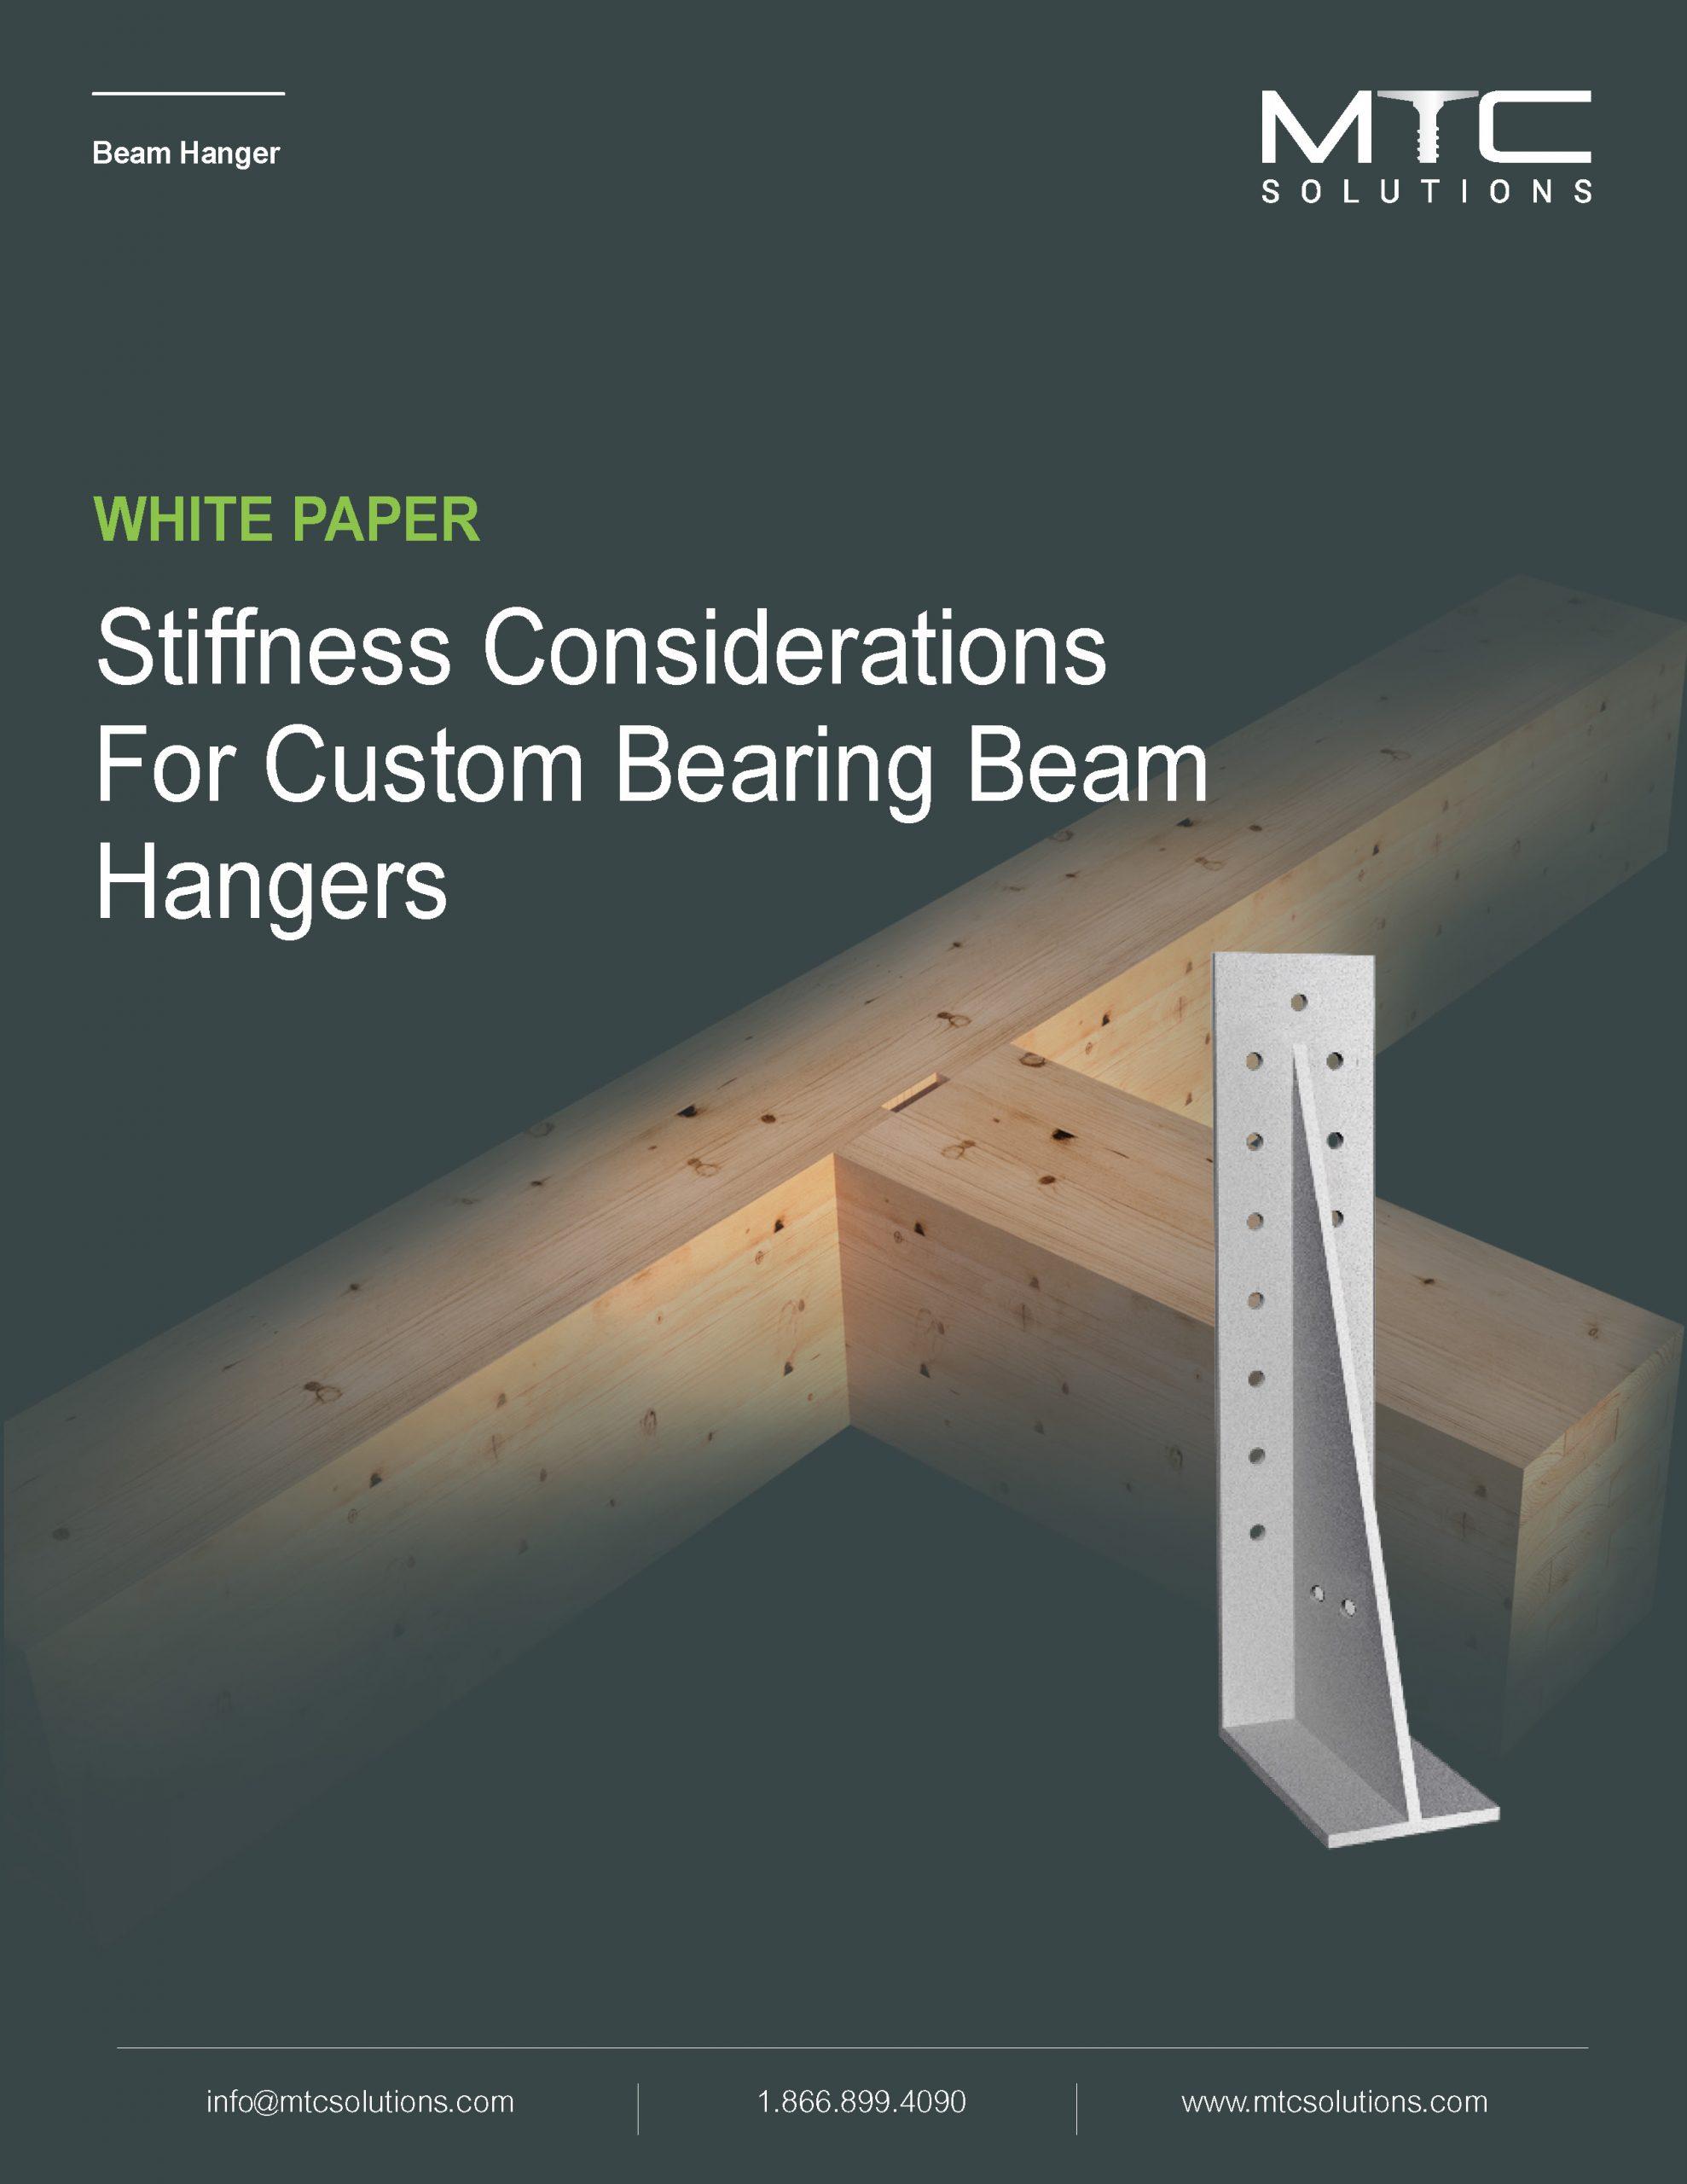 Stiffness Considerations for Custom Bearing Beam Hangers